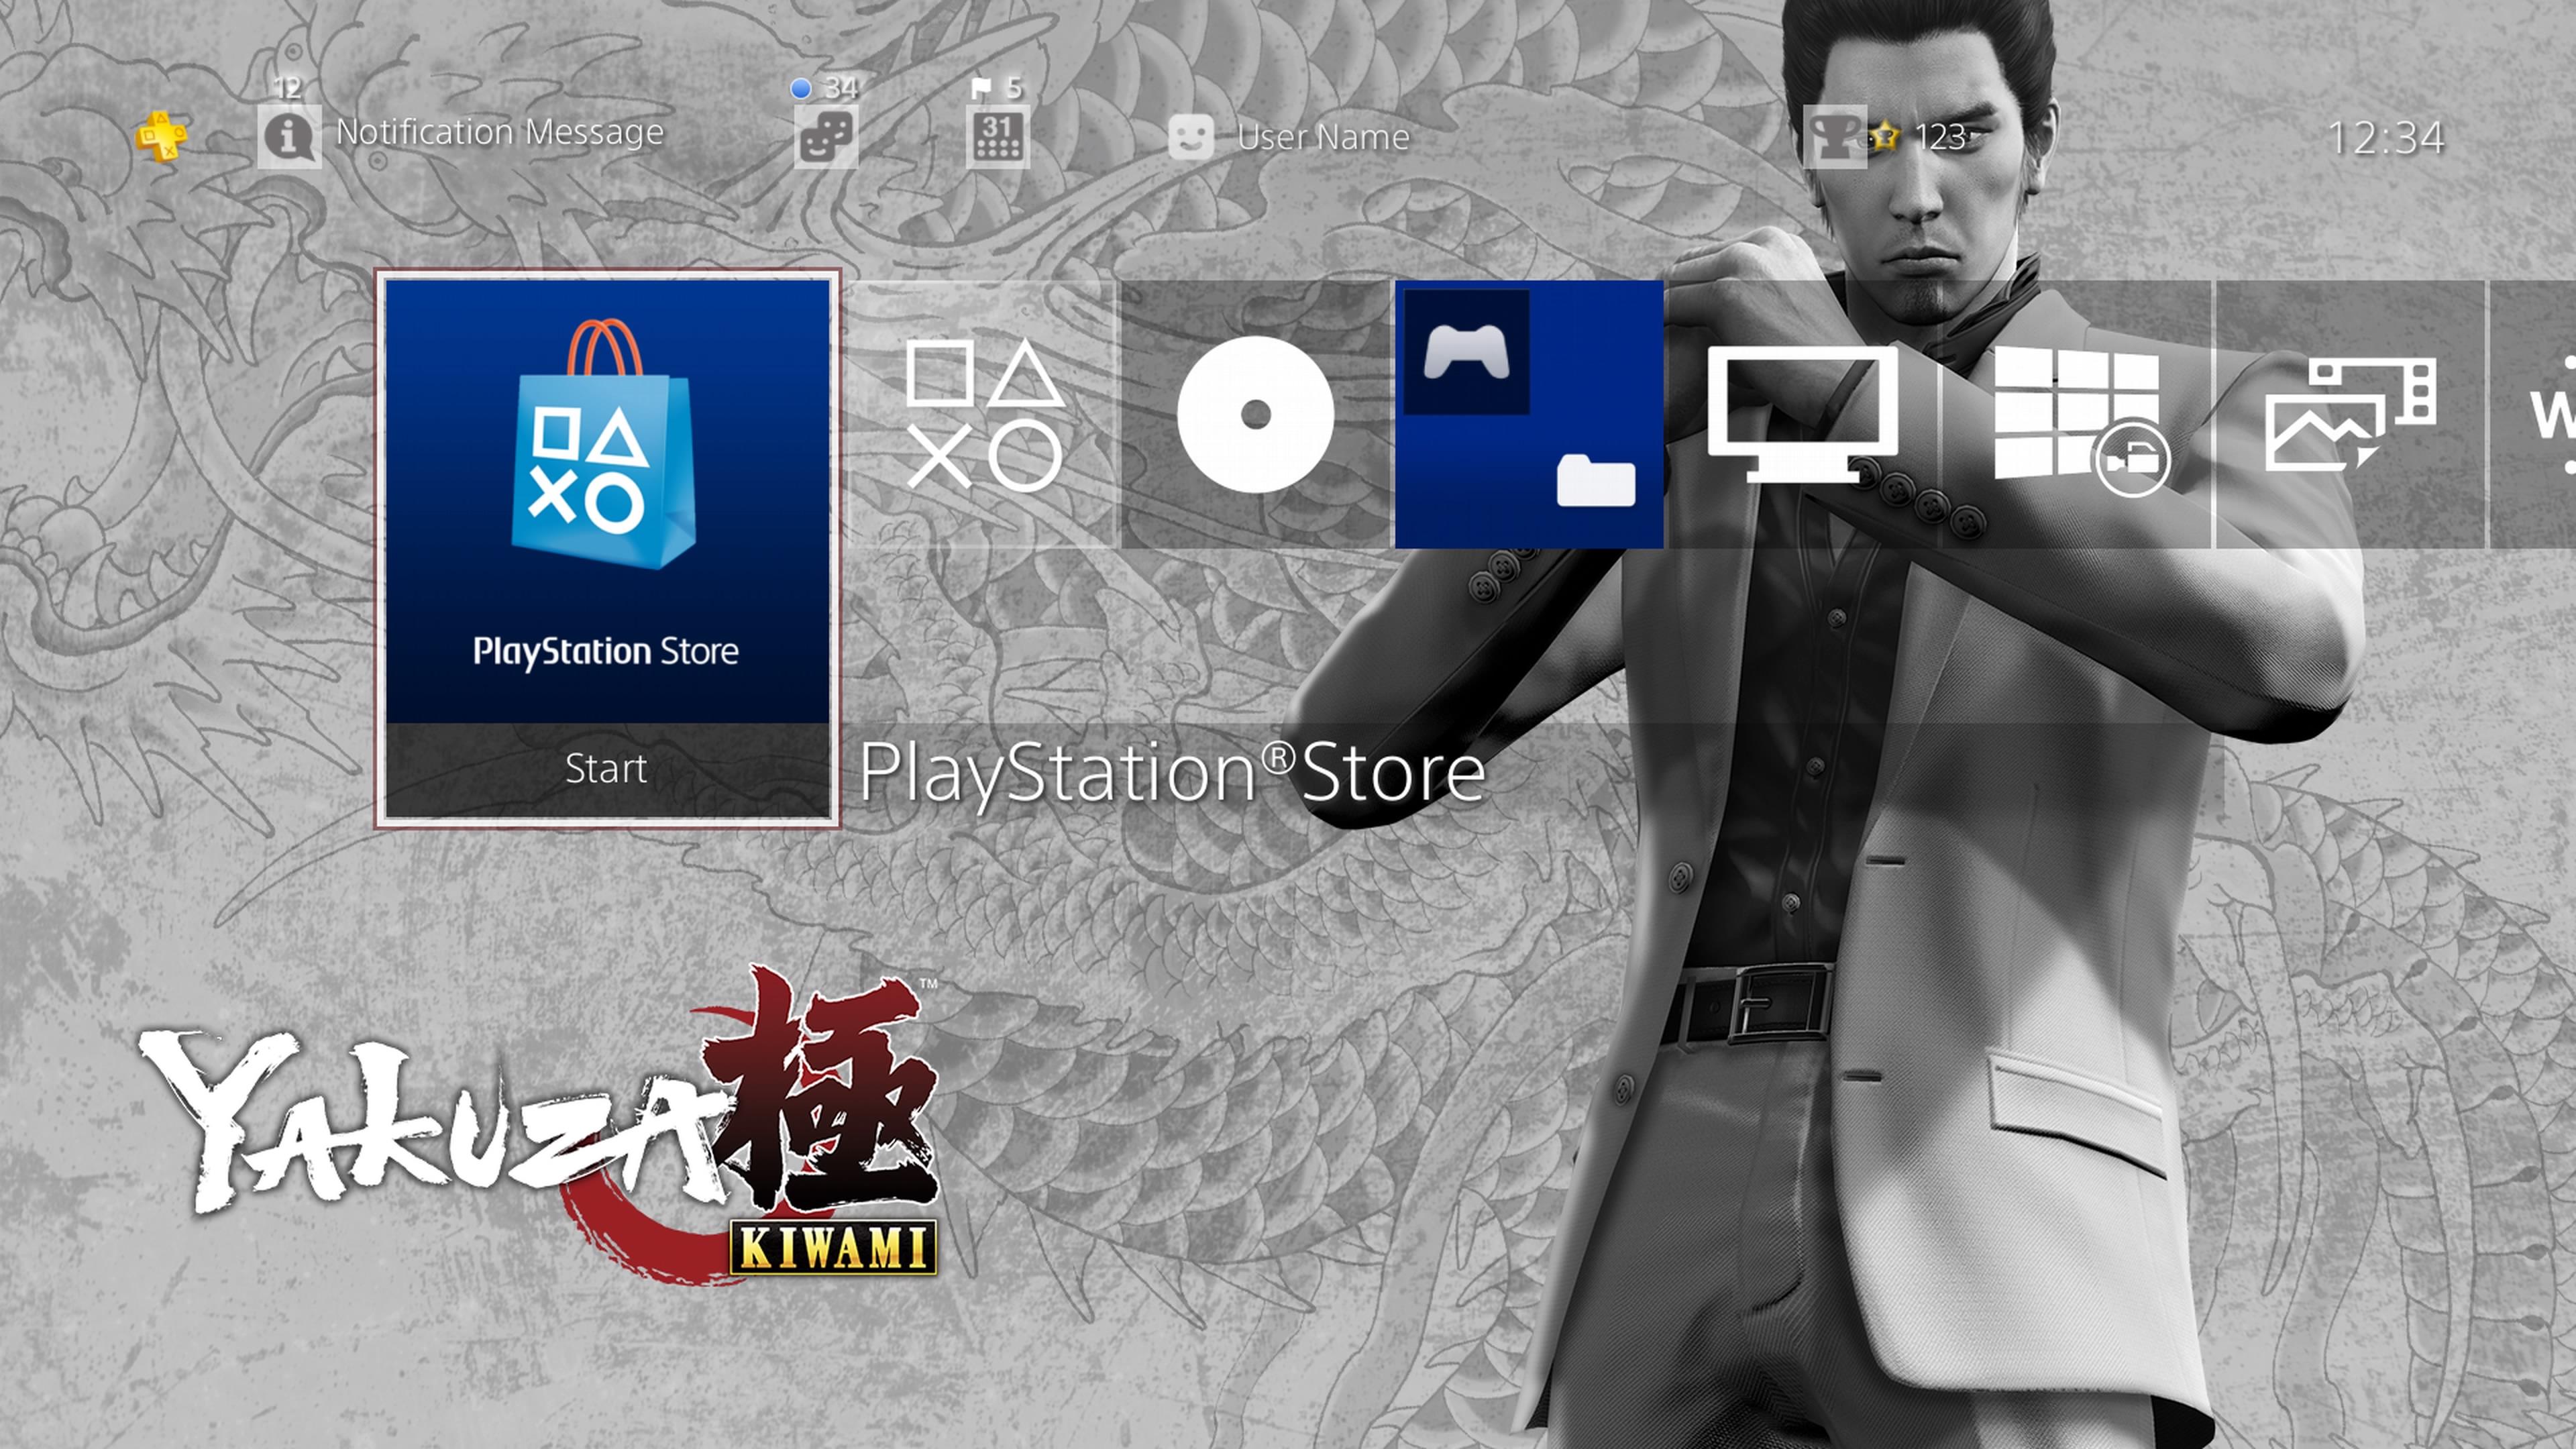 YakuzaKiwami PS4 Div 006